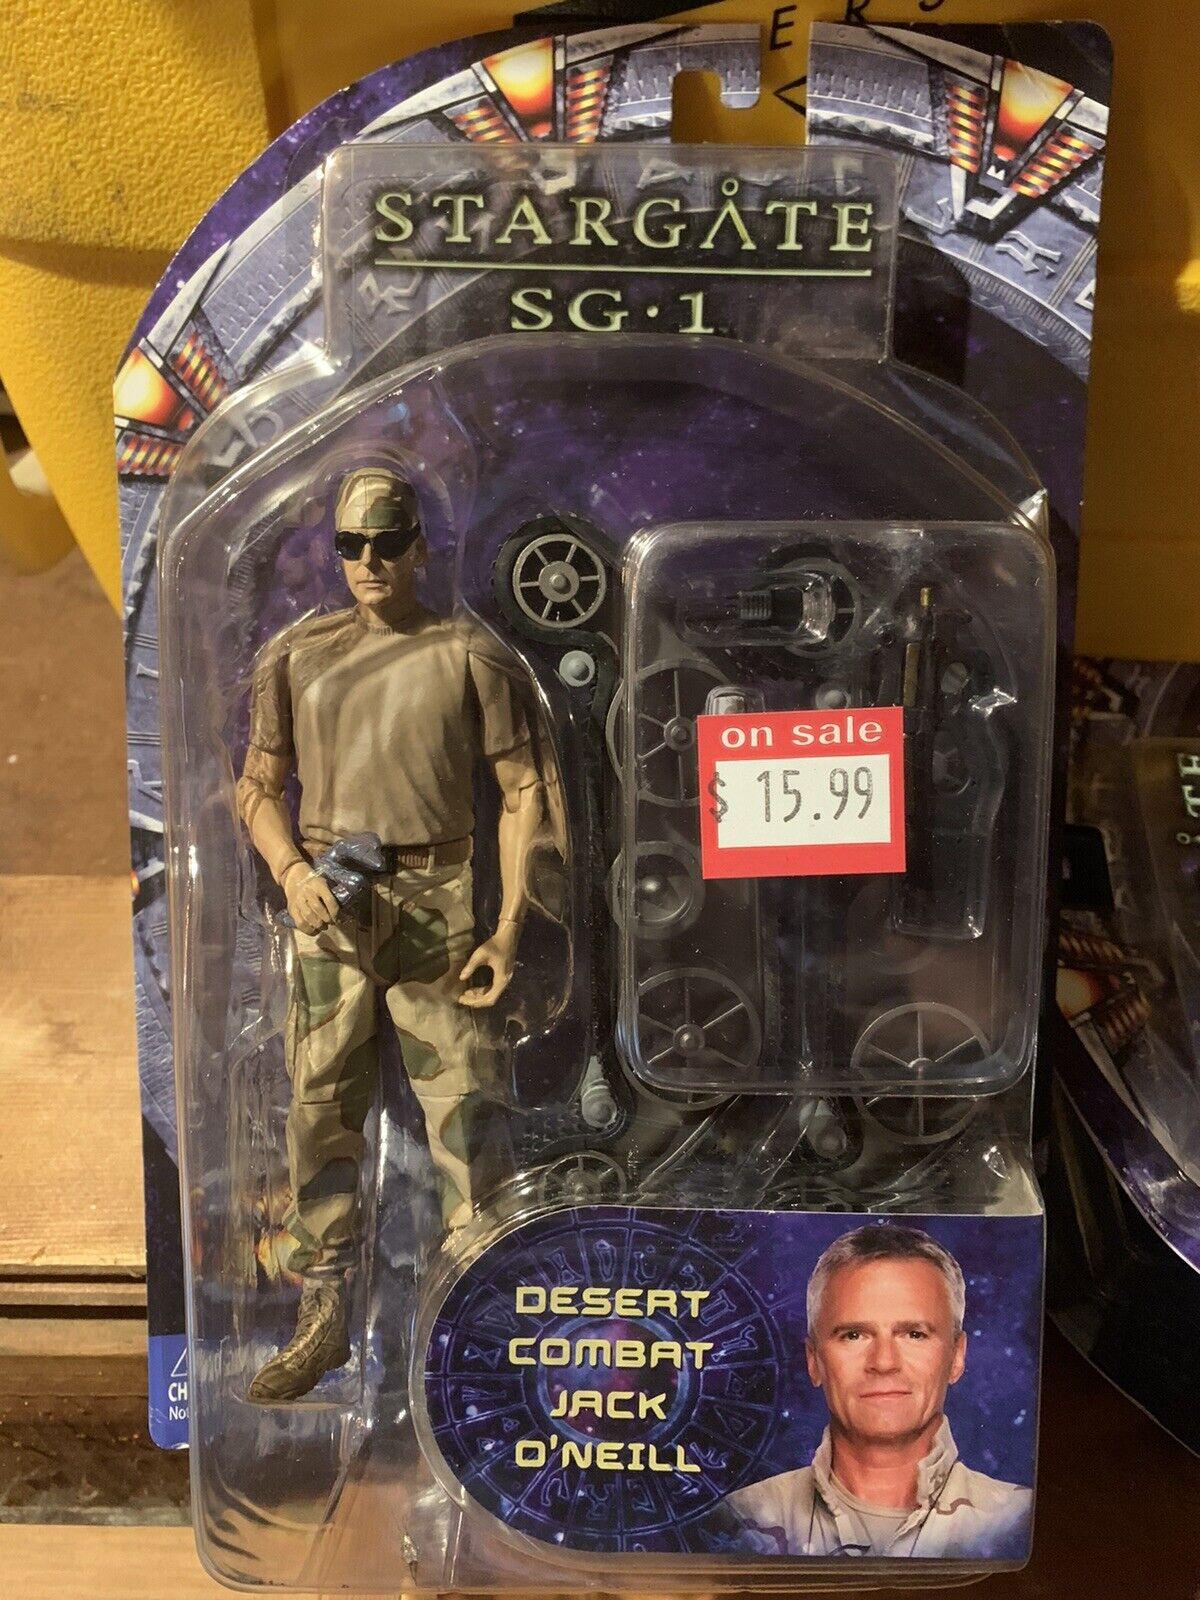 estrellagate SG1 Desert Combat Jack O'Neill Diamond Select azione cifra Series 4